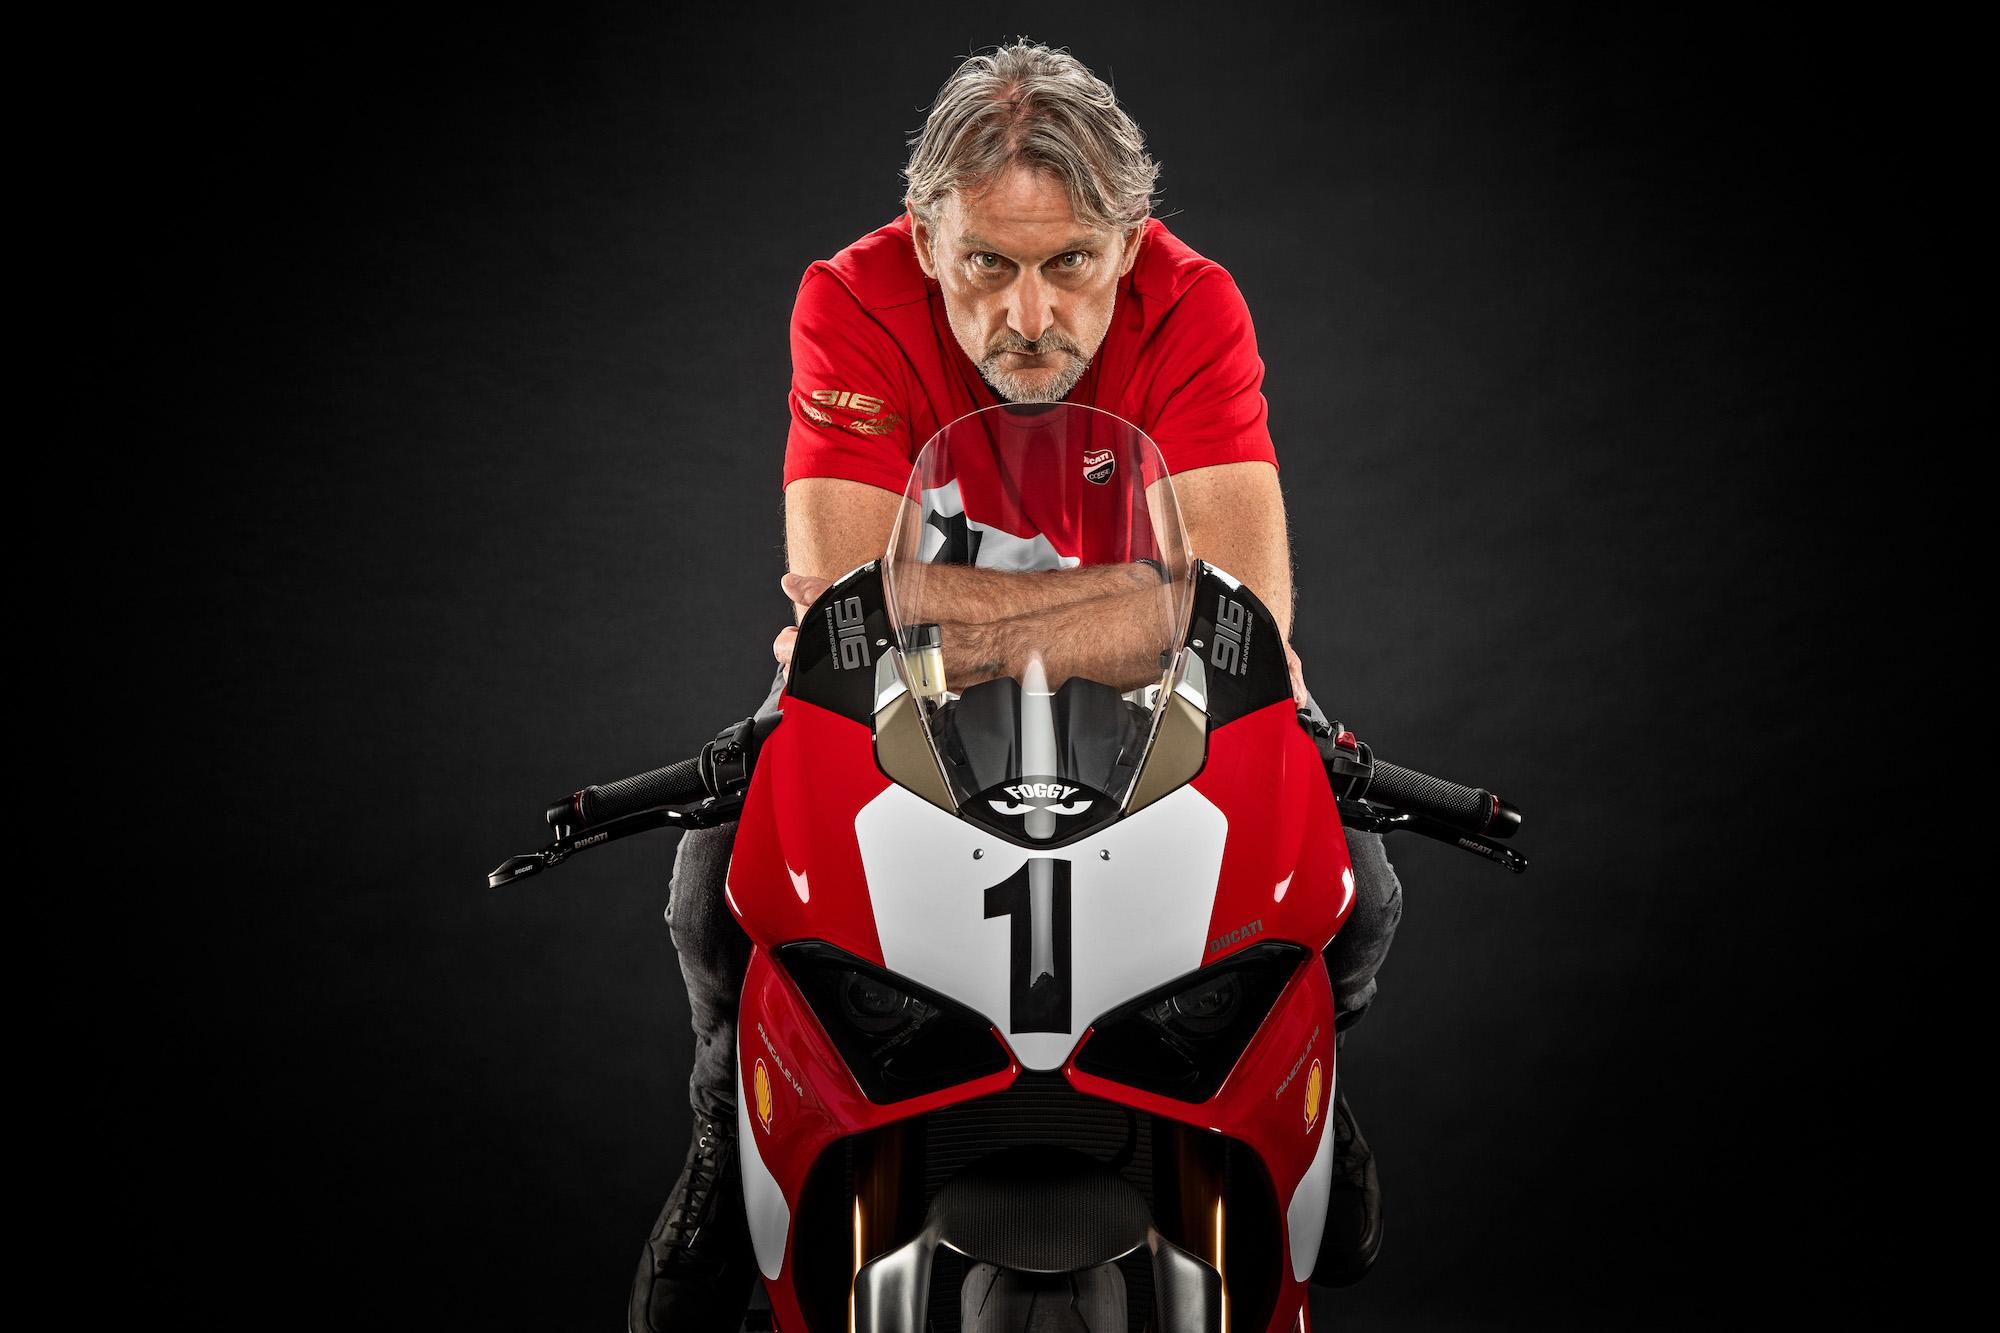 Prepárate para ver la Ducati Panigale V4 25º Aniversario 916